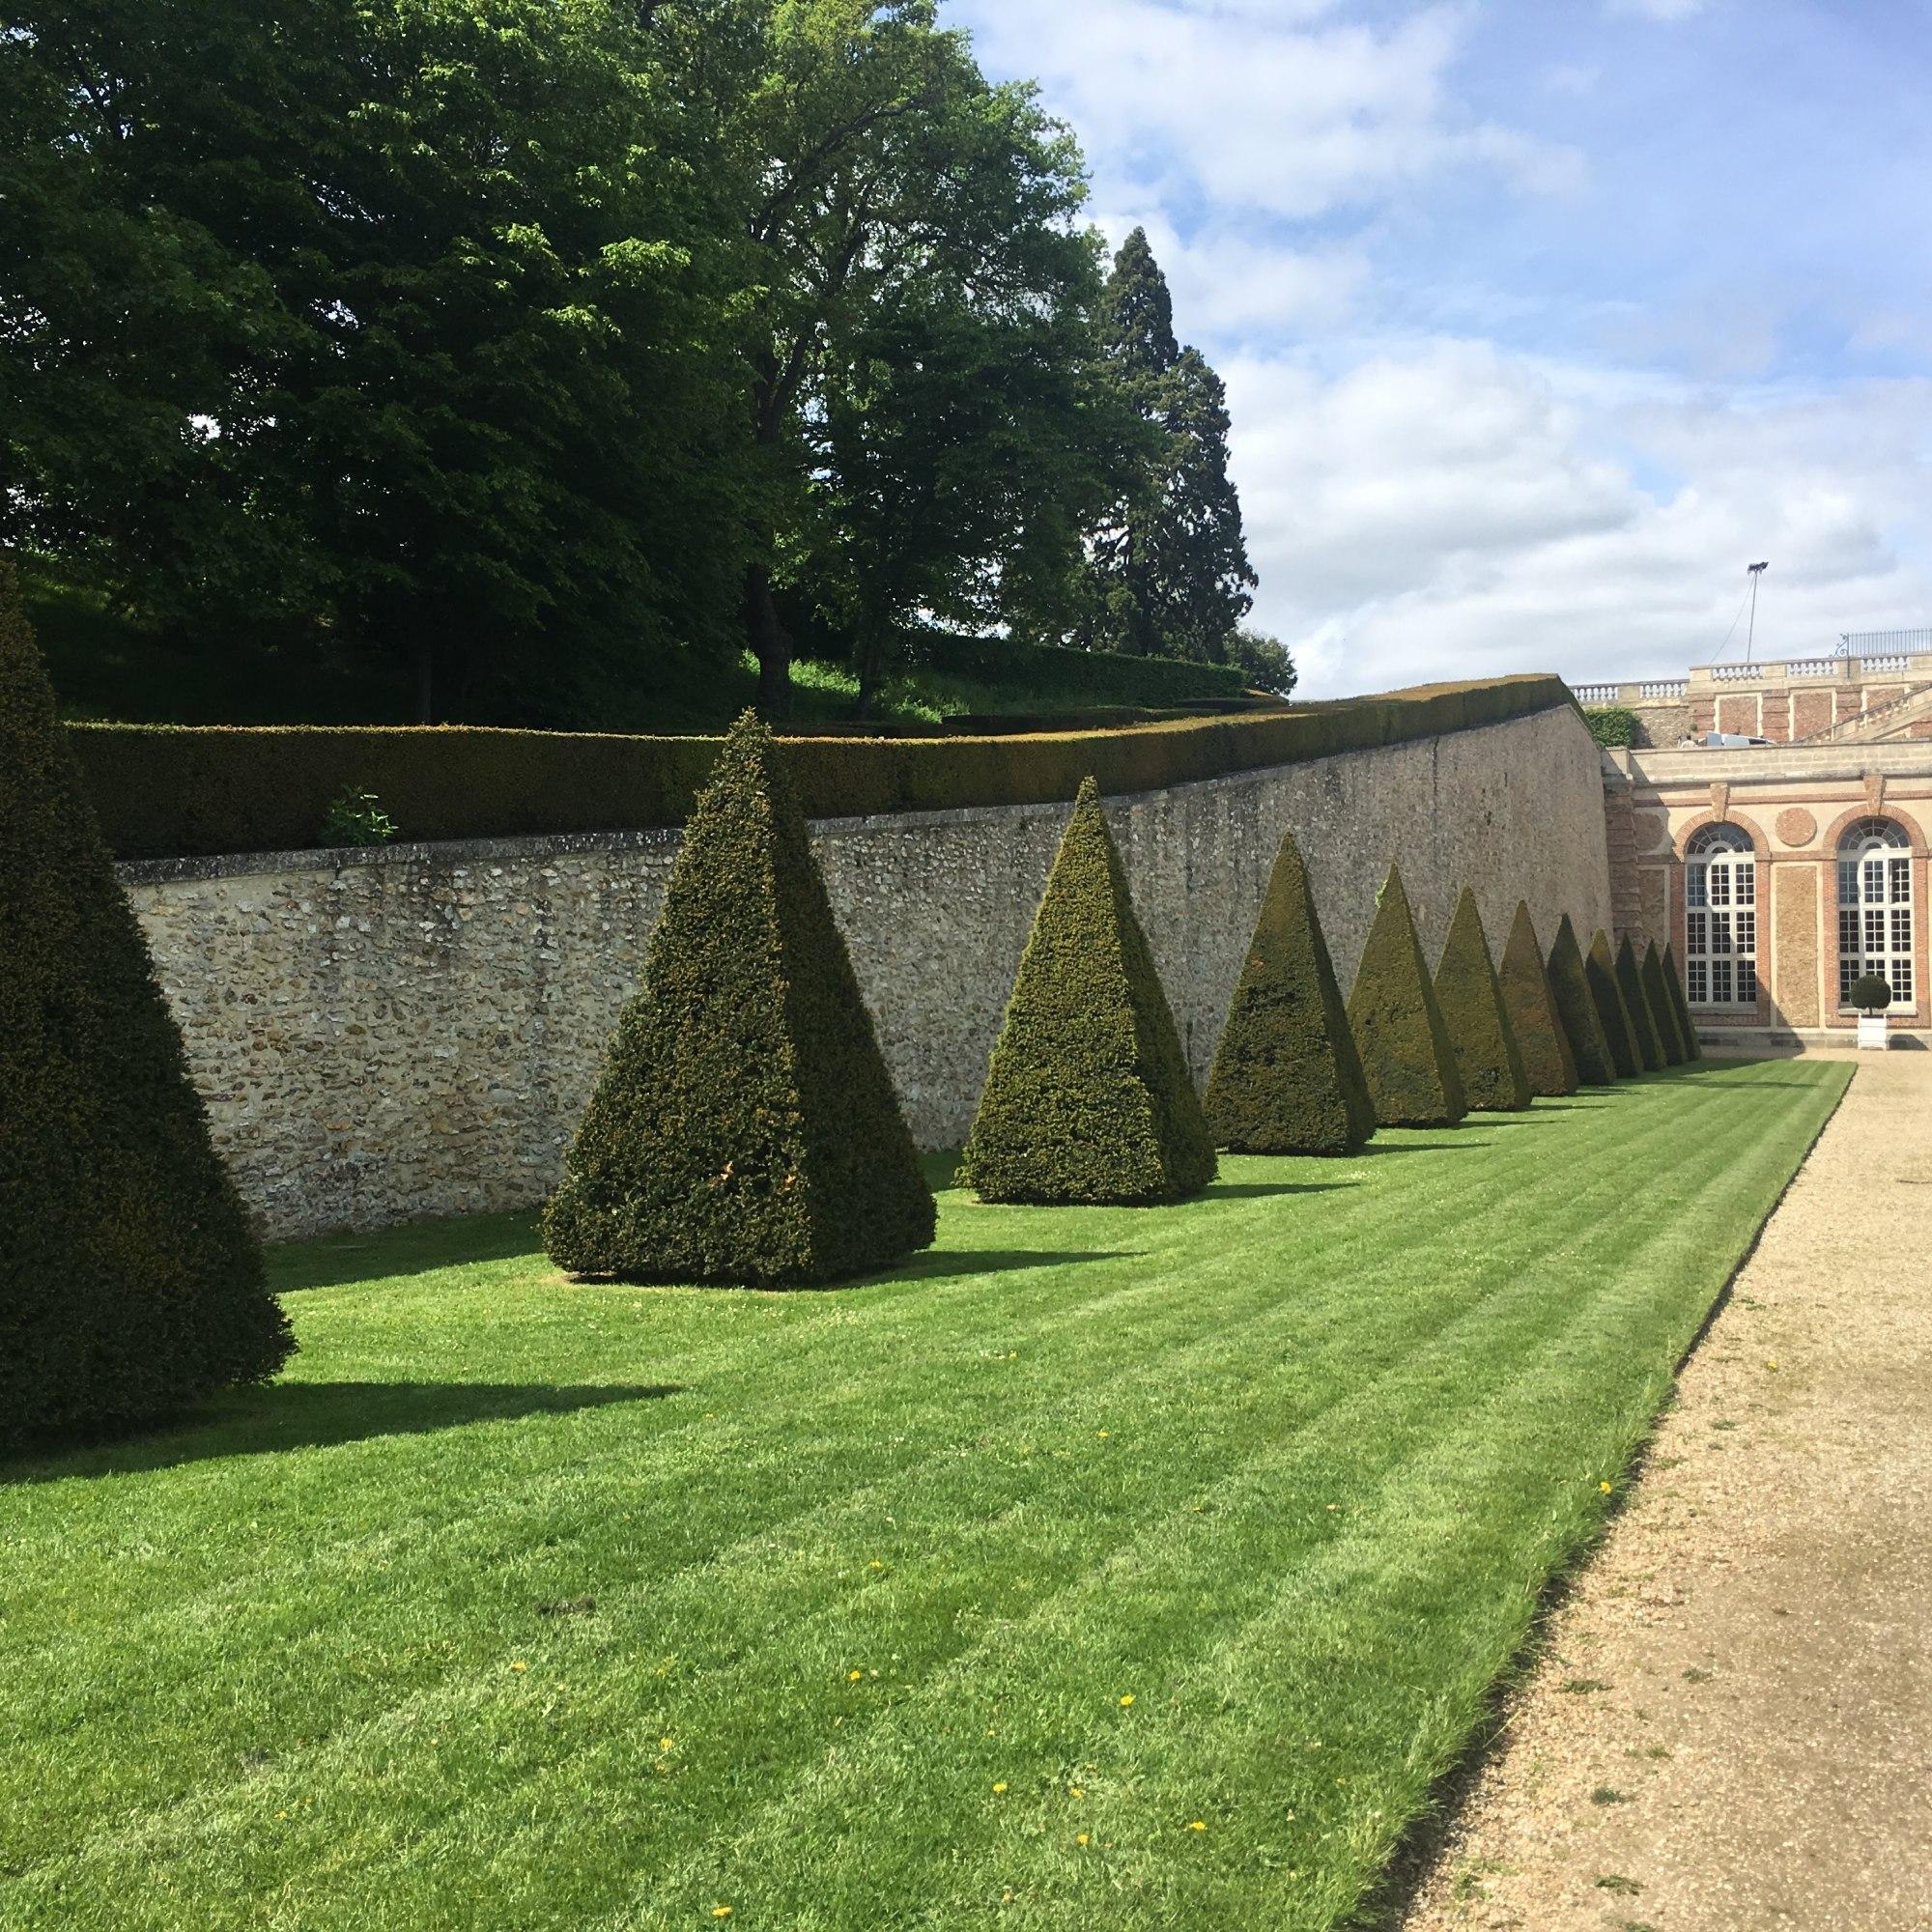 green pyramid trees in garden